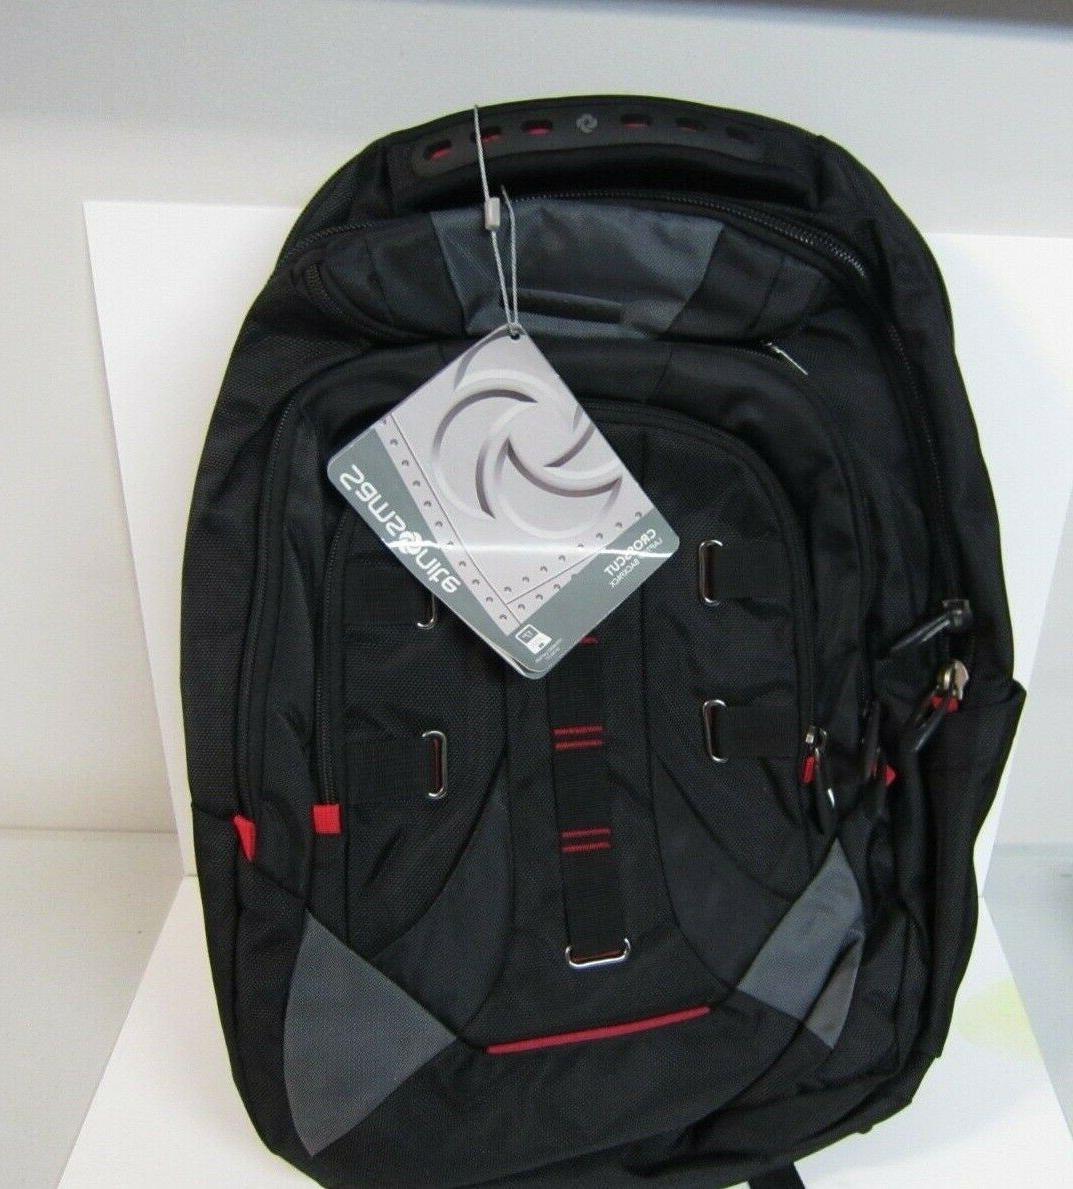 Samsonite Laptop Backpack - Black